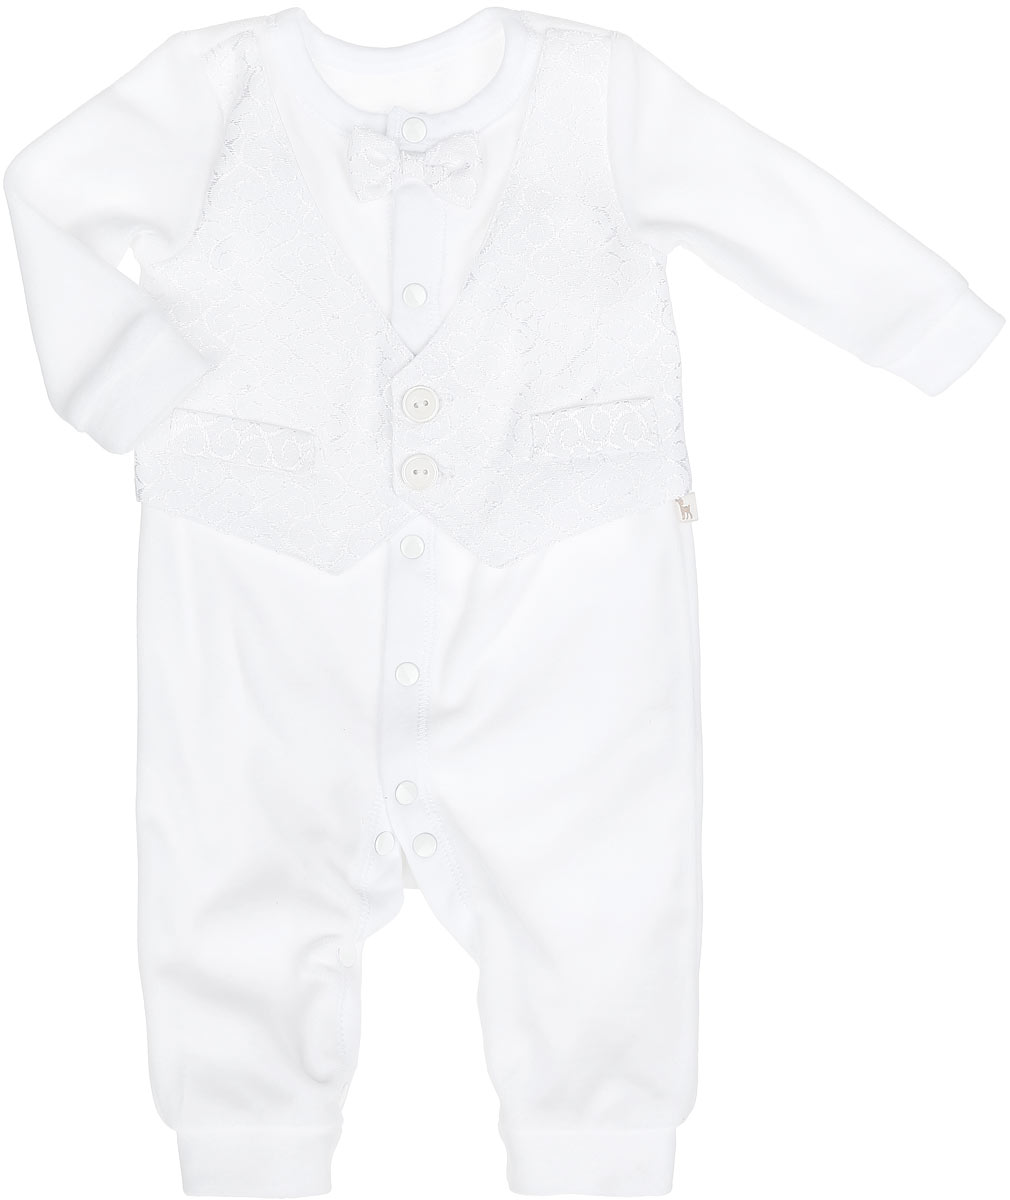 Комбинезон для мальчика БЕМБІ, цвет: белый. KB93-1. Размер 56, 1 месяц бембі полукомбинезон